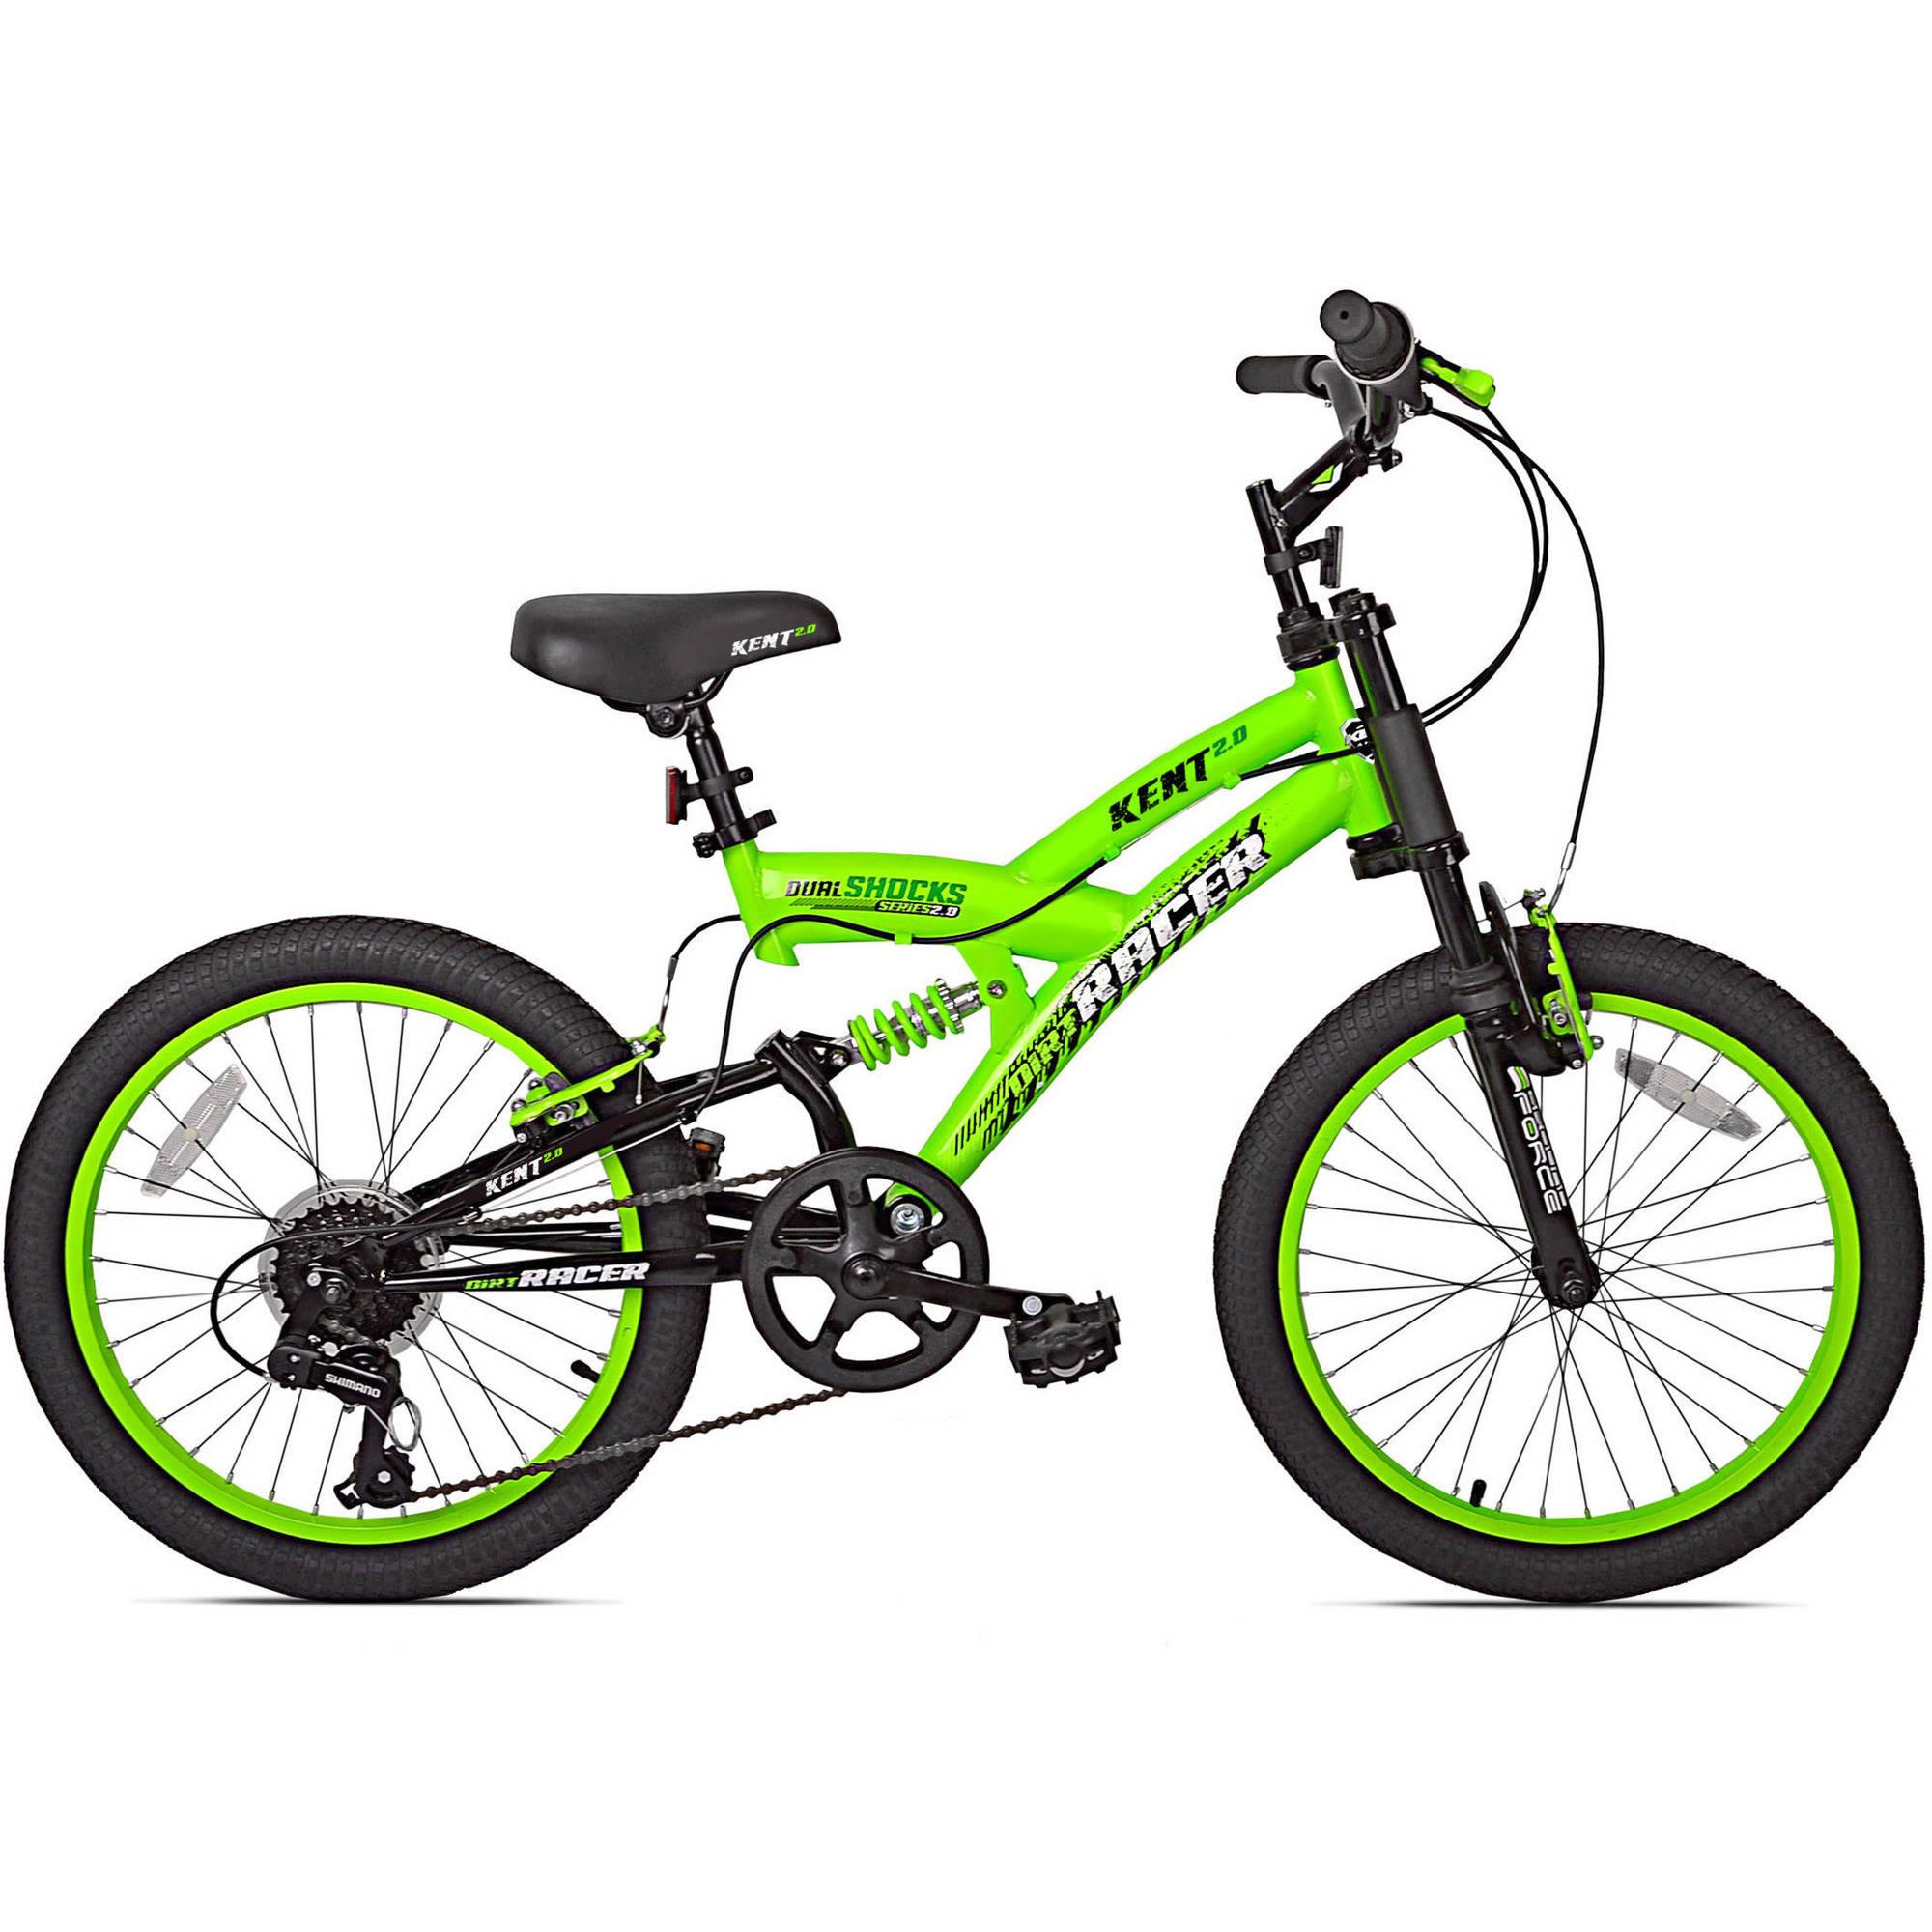 kent bike